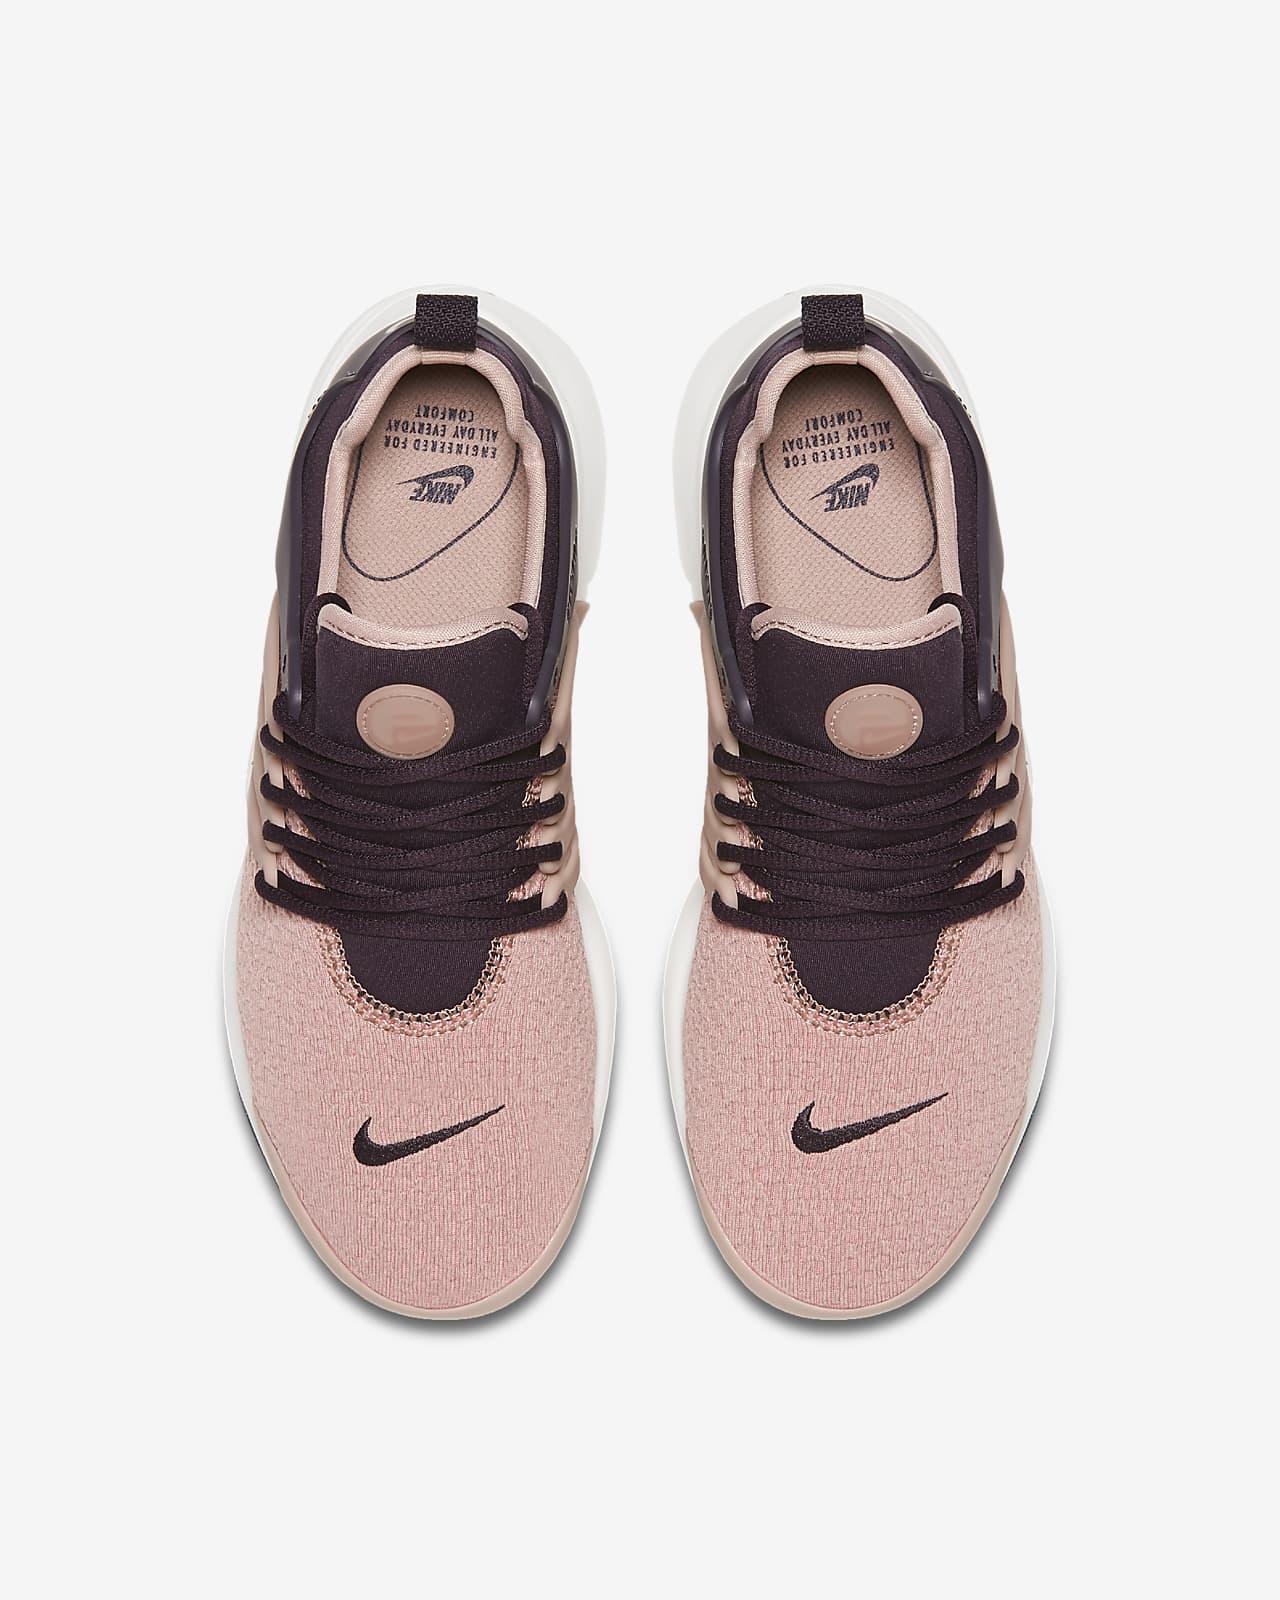 Nike Air Presto Women's Shoe. Nike SG